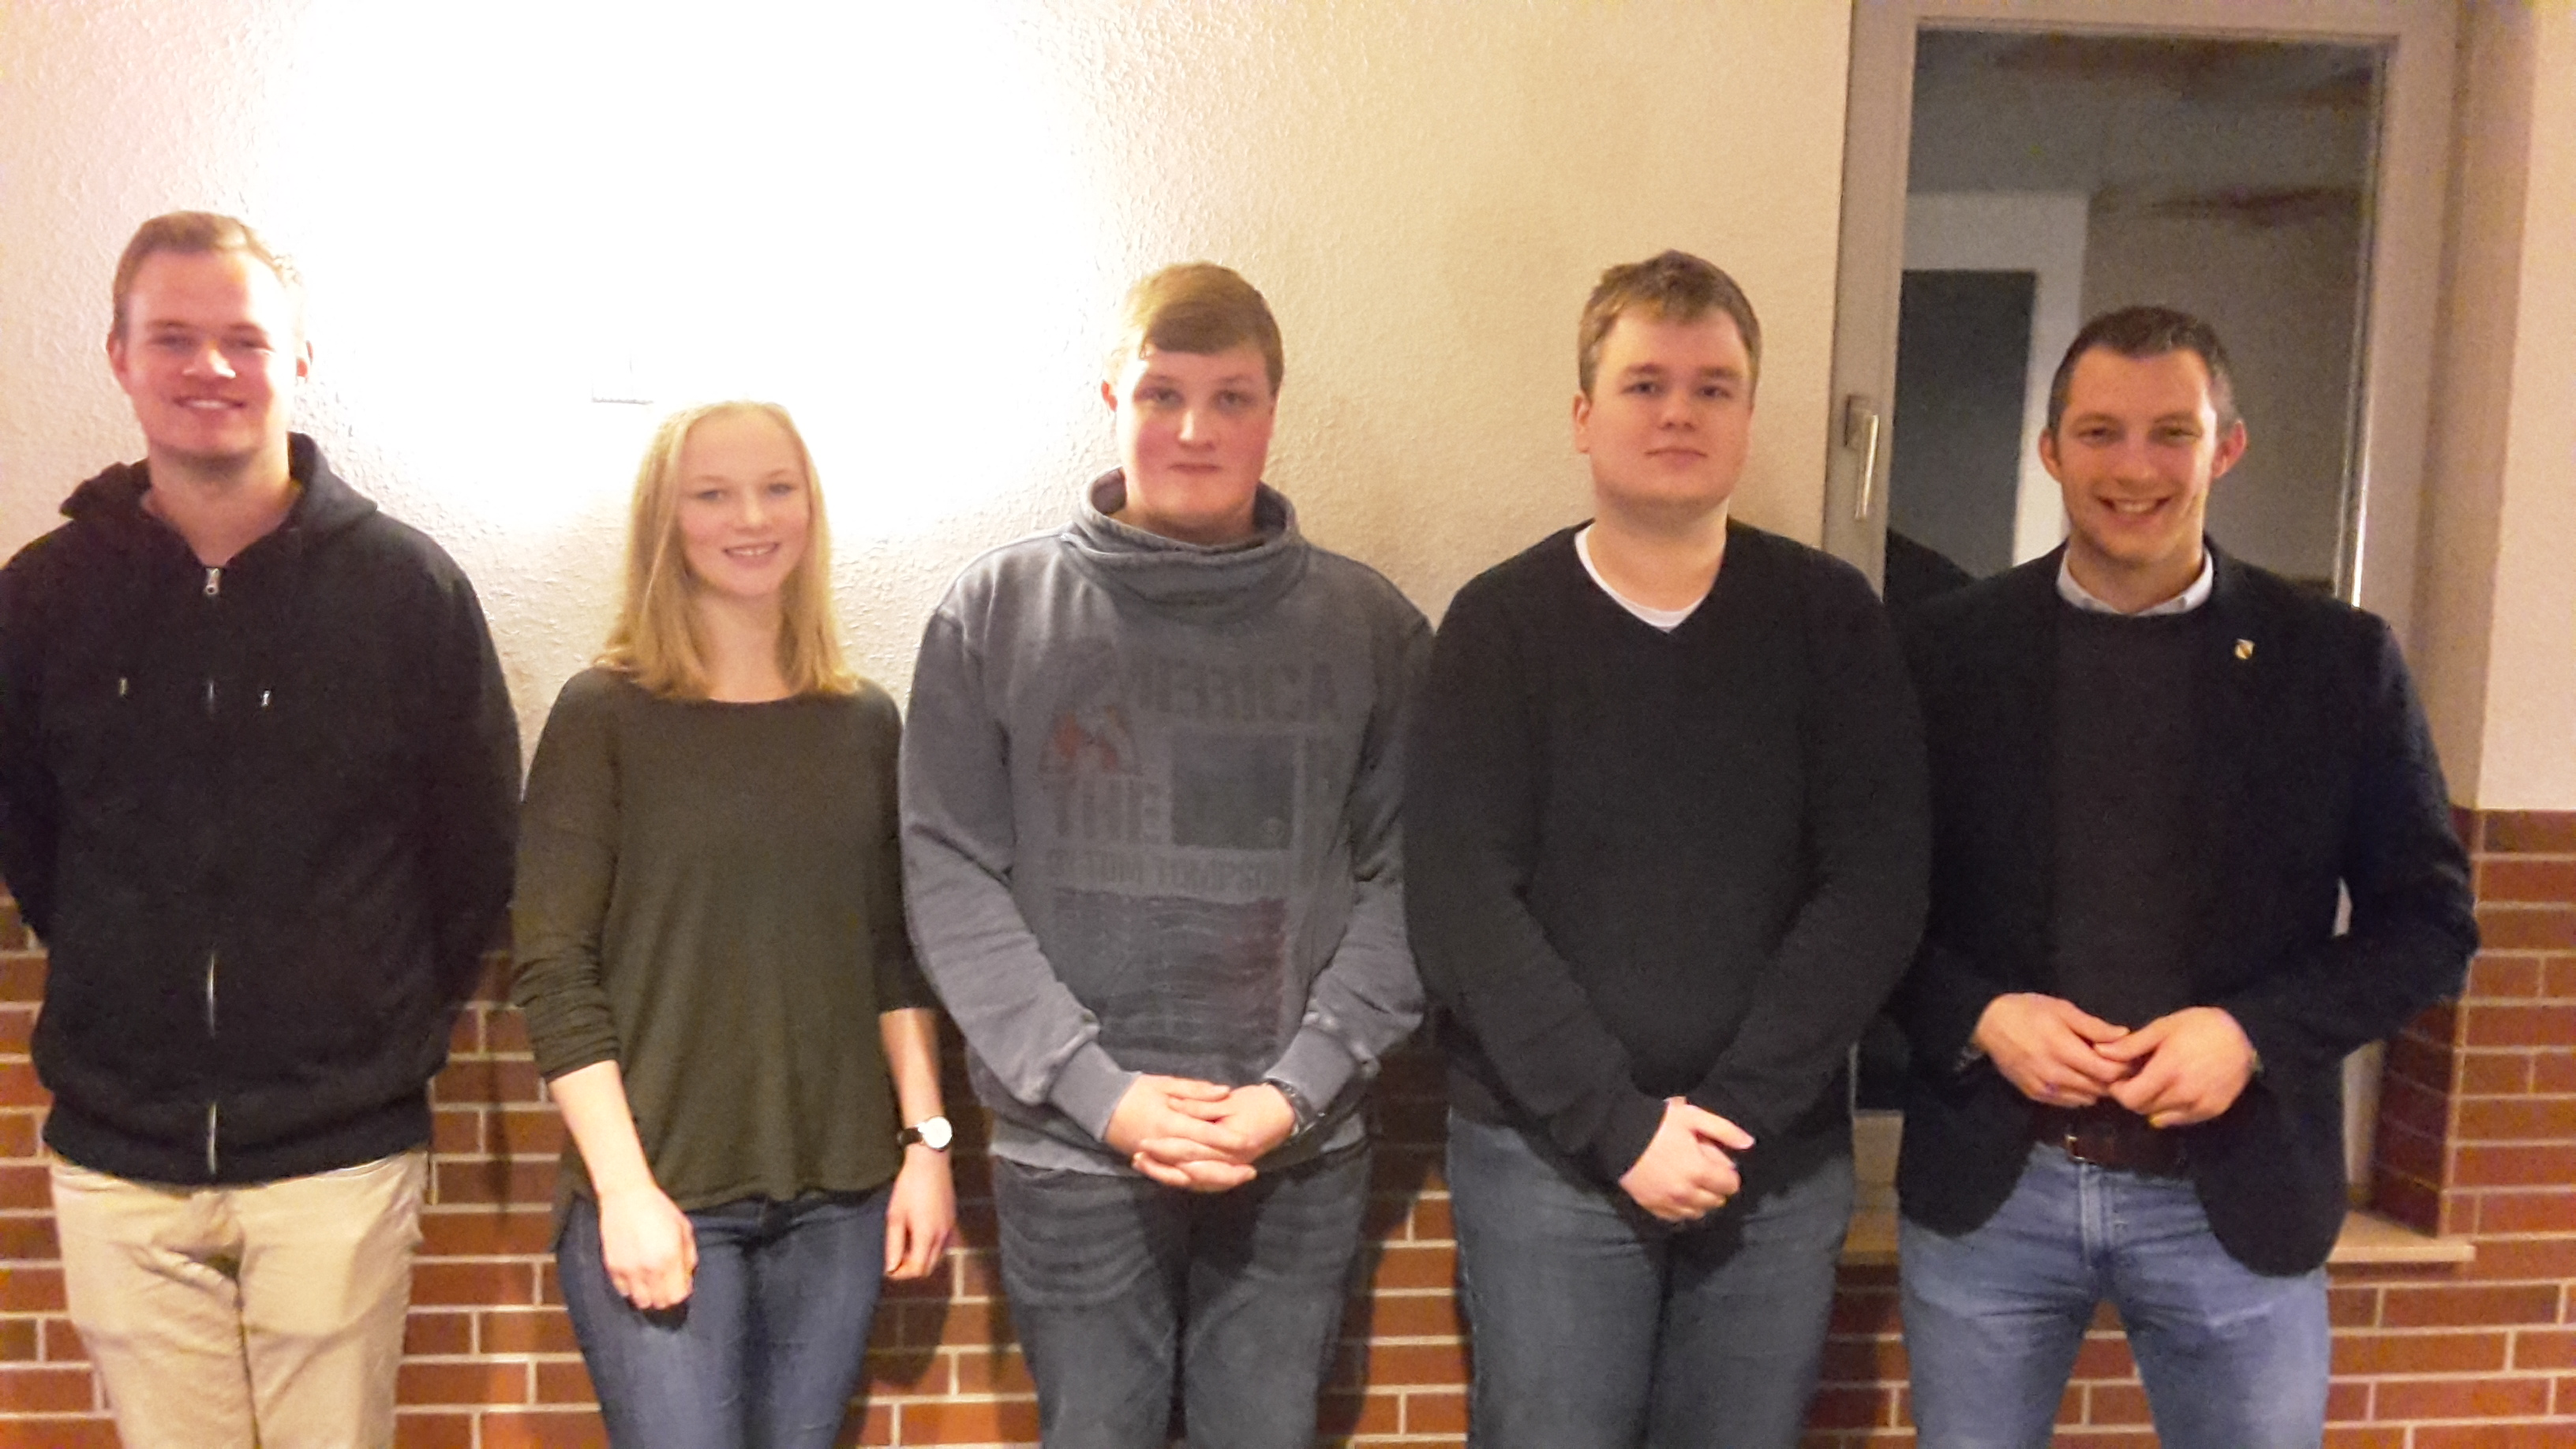 (v.l.n.r.) Christoph Lübberding (Kassenprüfer), Laura Busse, Dominik Bruns, Jannis Brinkmann und André Hüttemeyer.